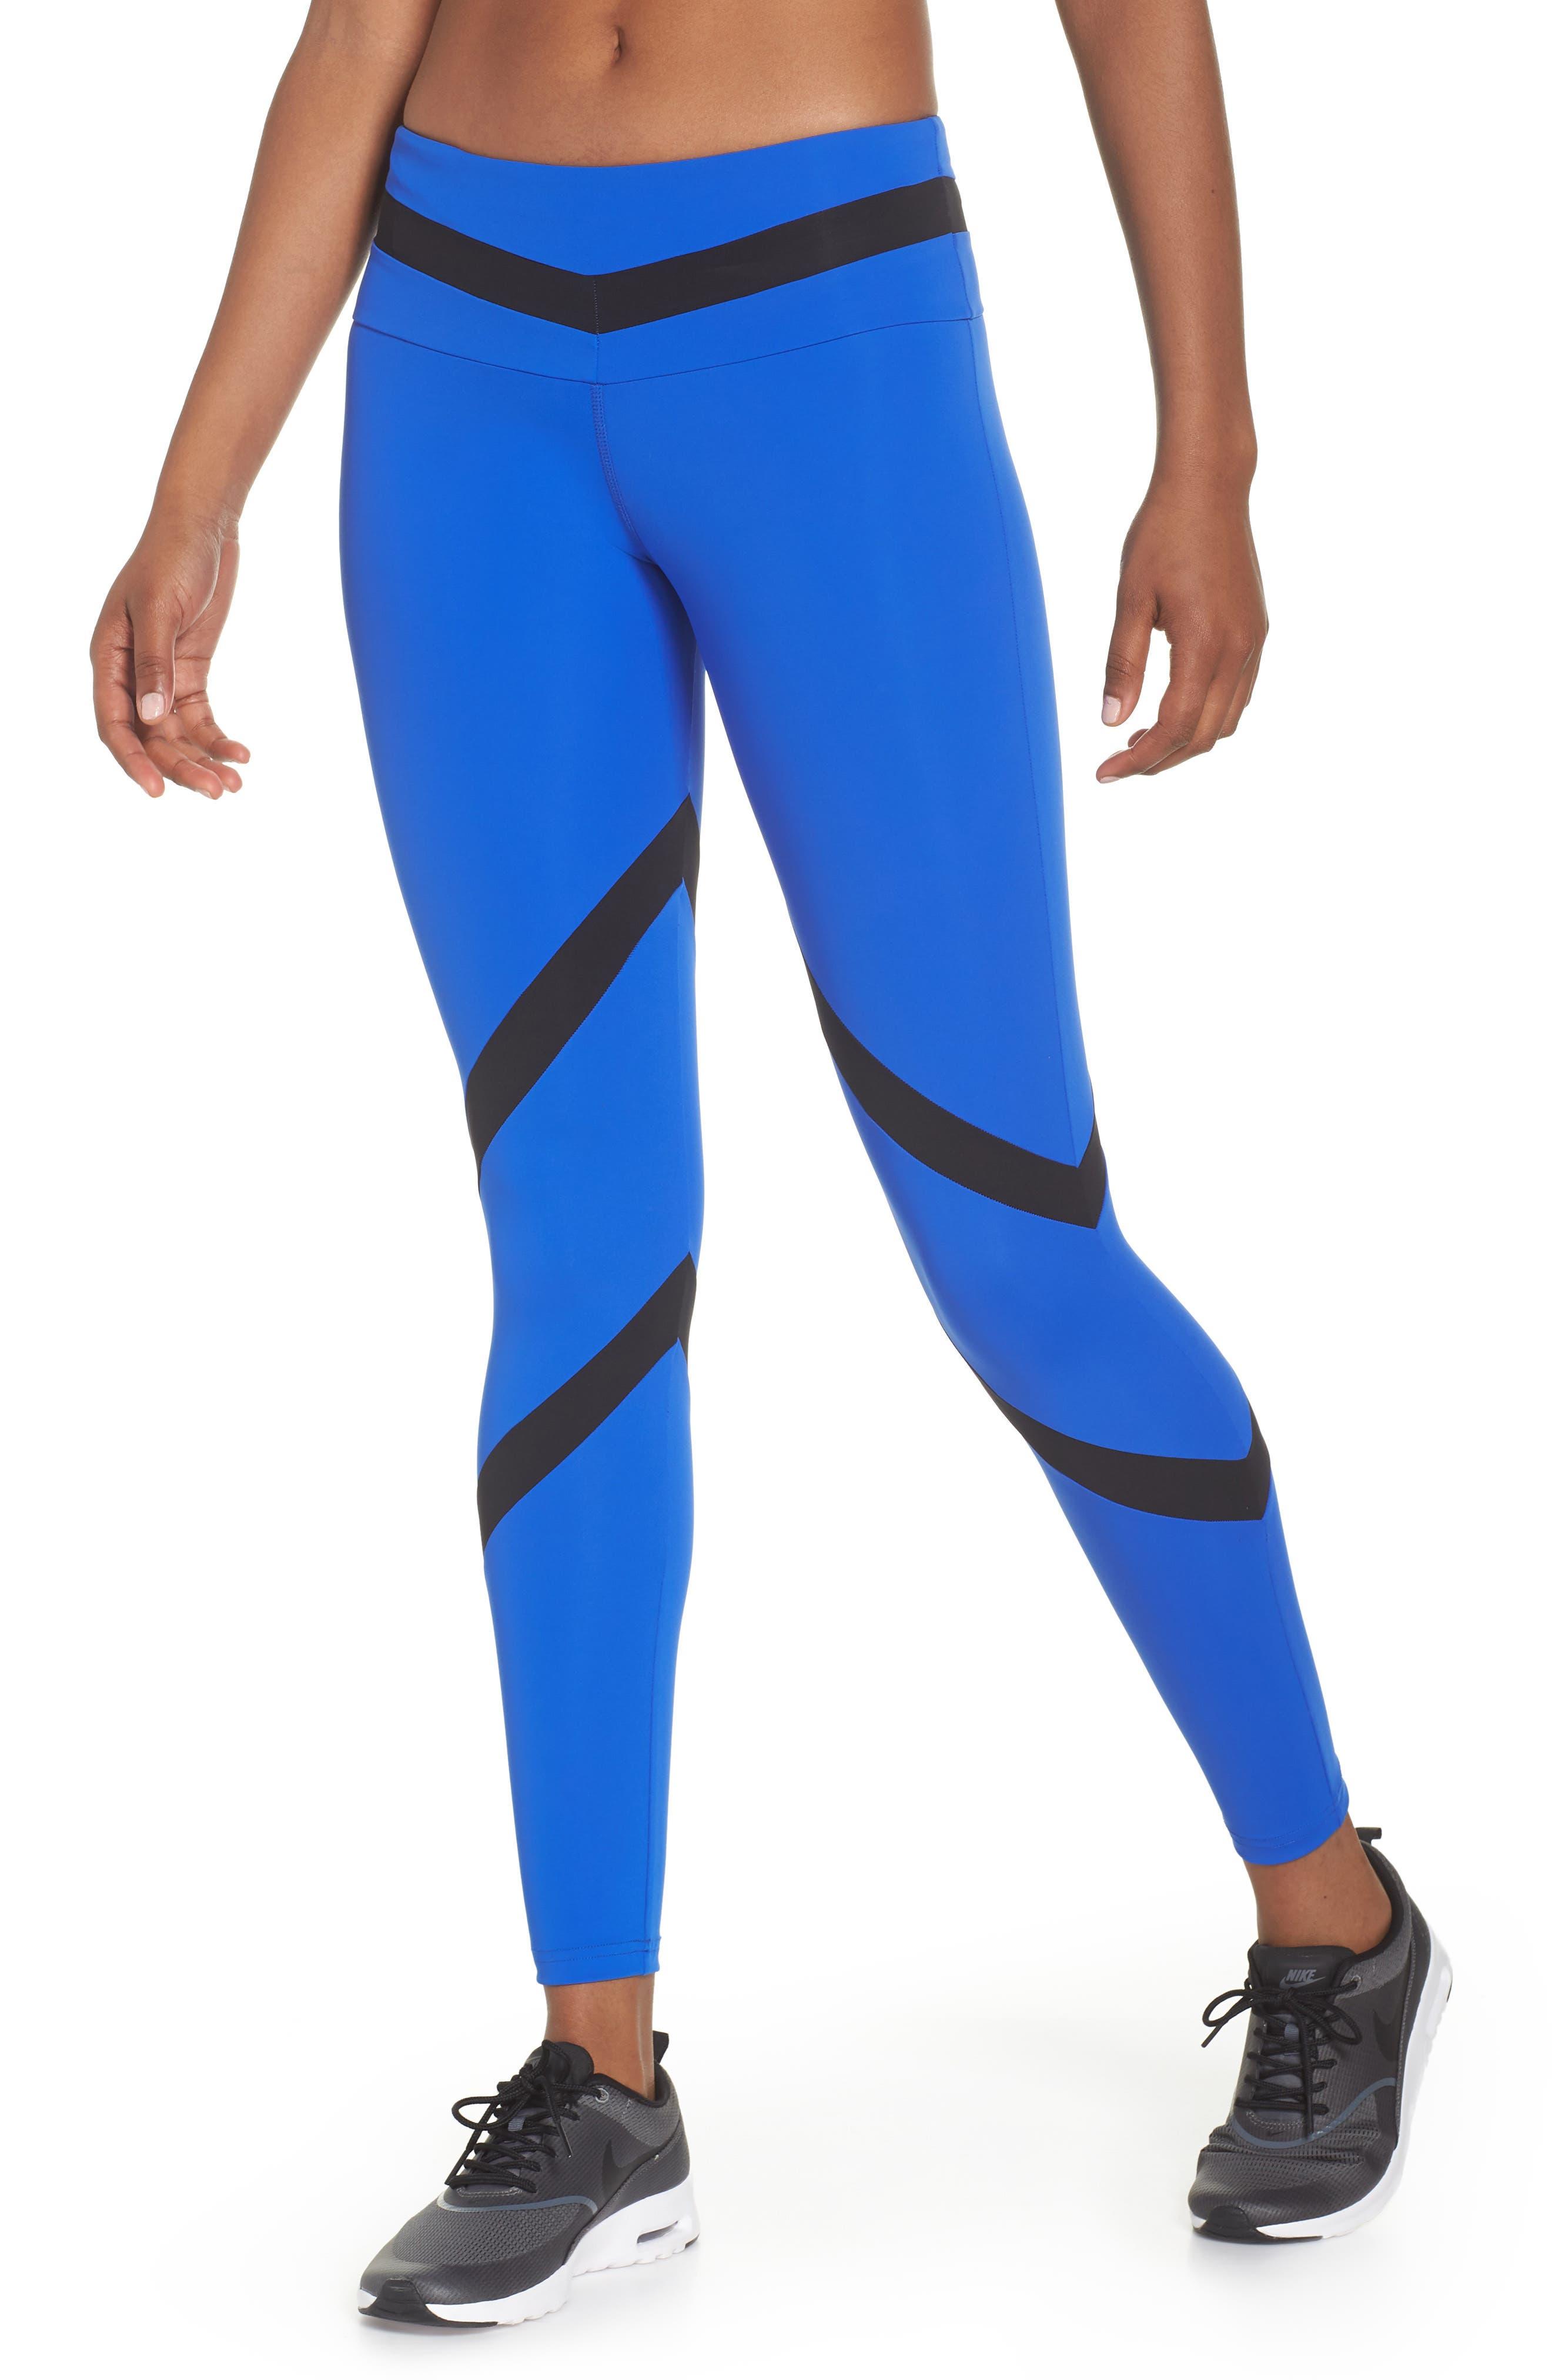 BoomBoom Athletica Tricolor Leggings,                             Main thumbnail 1, color,                             Cobalt Blue/ Black